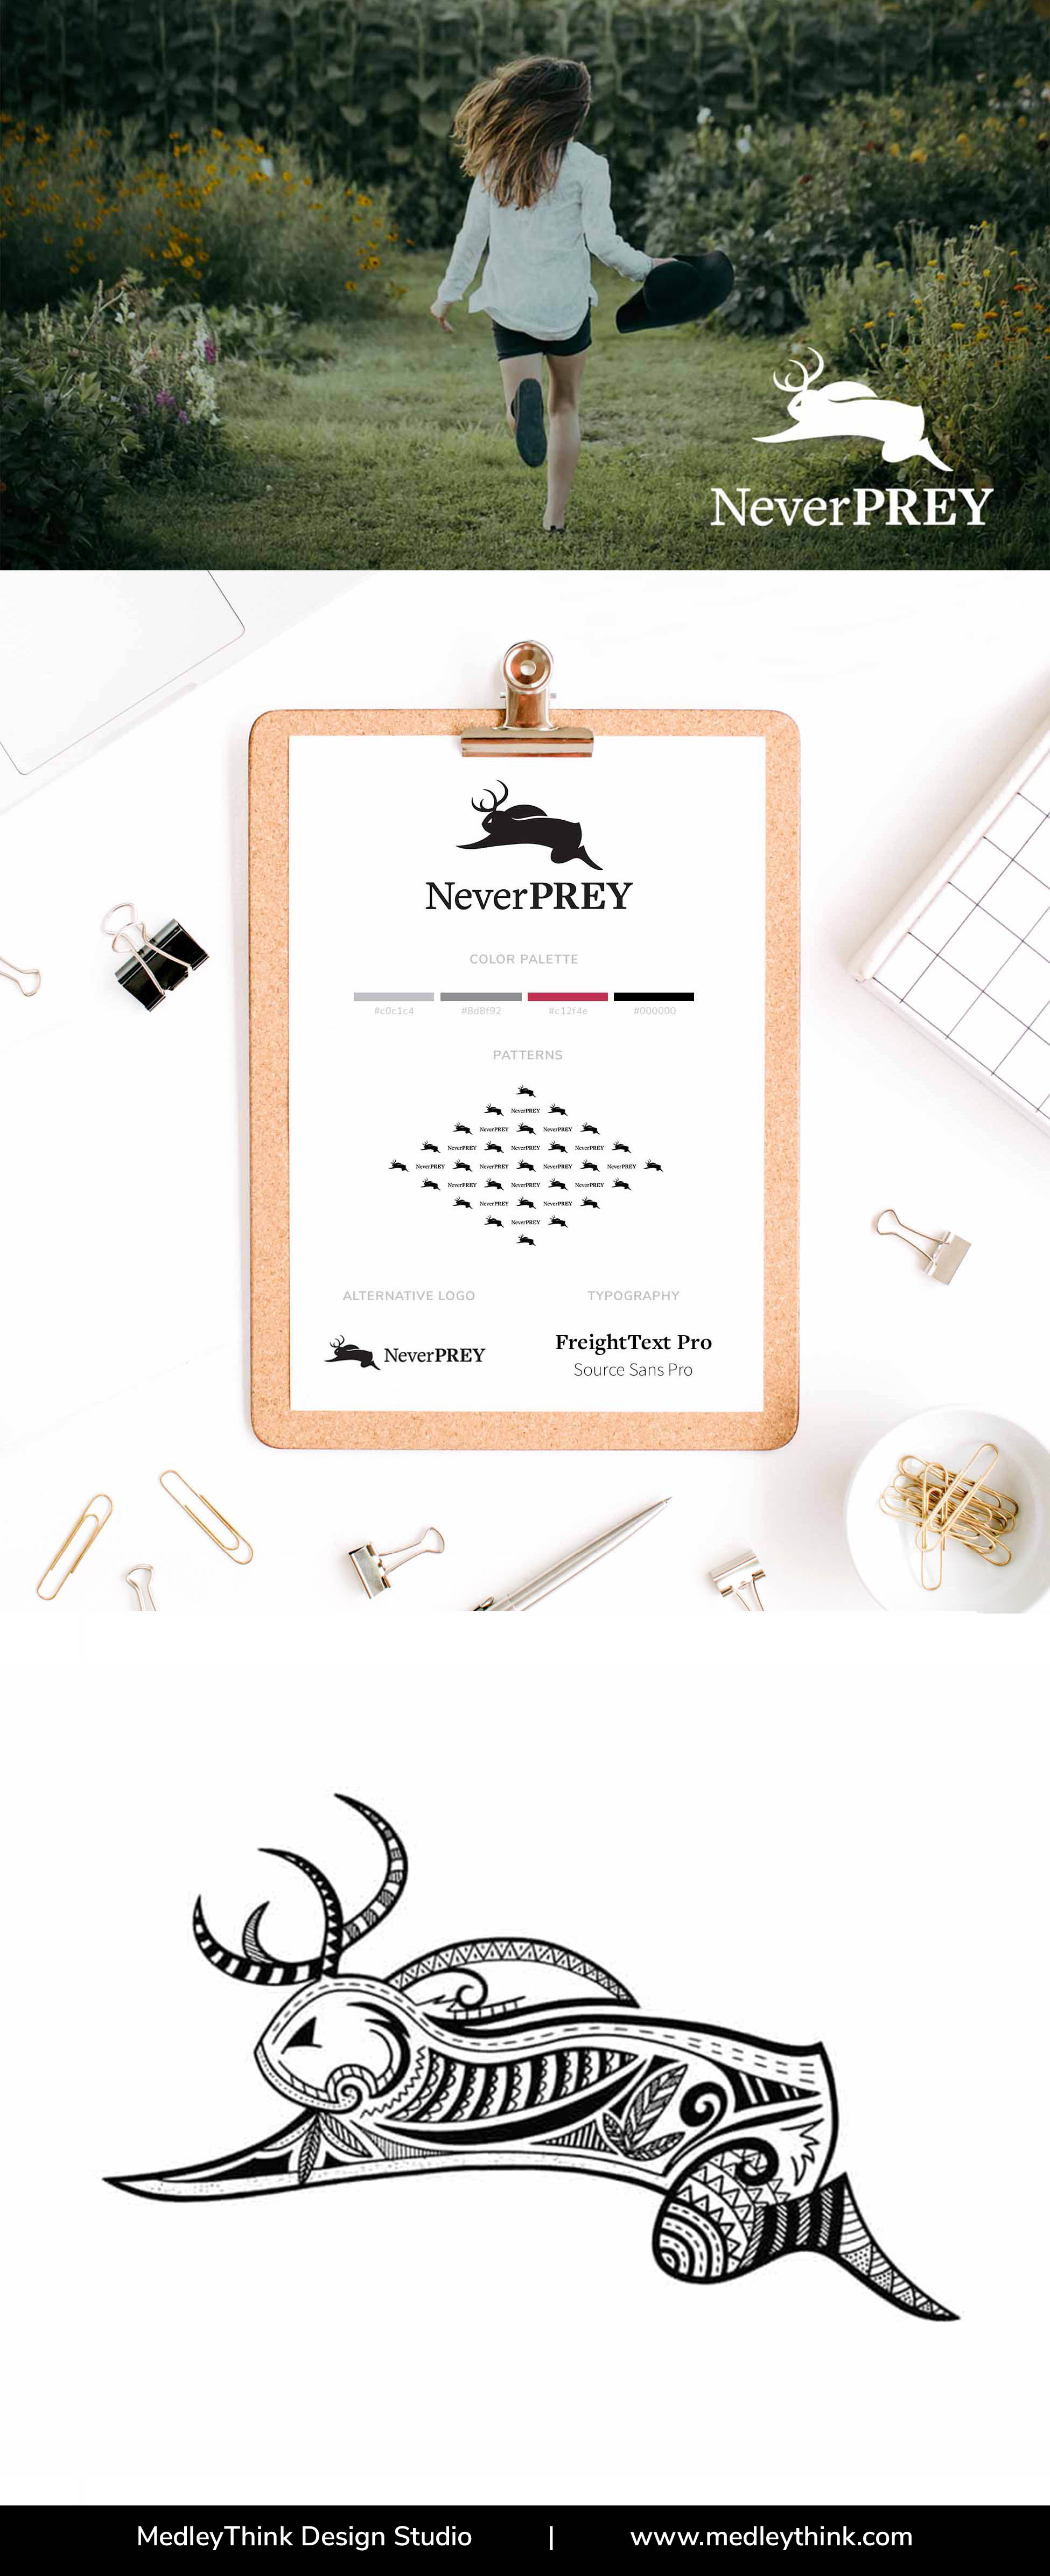 Branding Style Board for NeverPrey | More on our website www.medleythink.com #moodboard #inspirationboard #colorpalette #branding